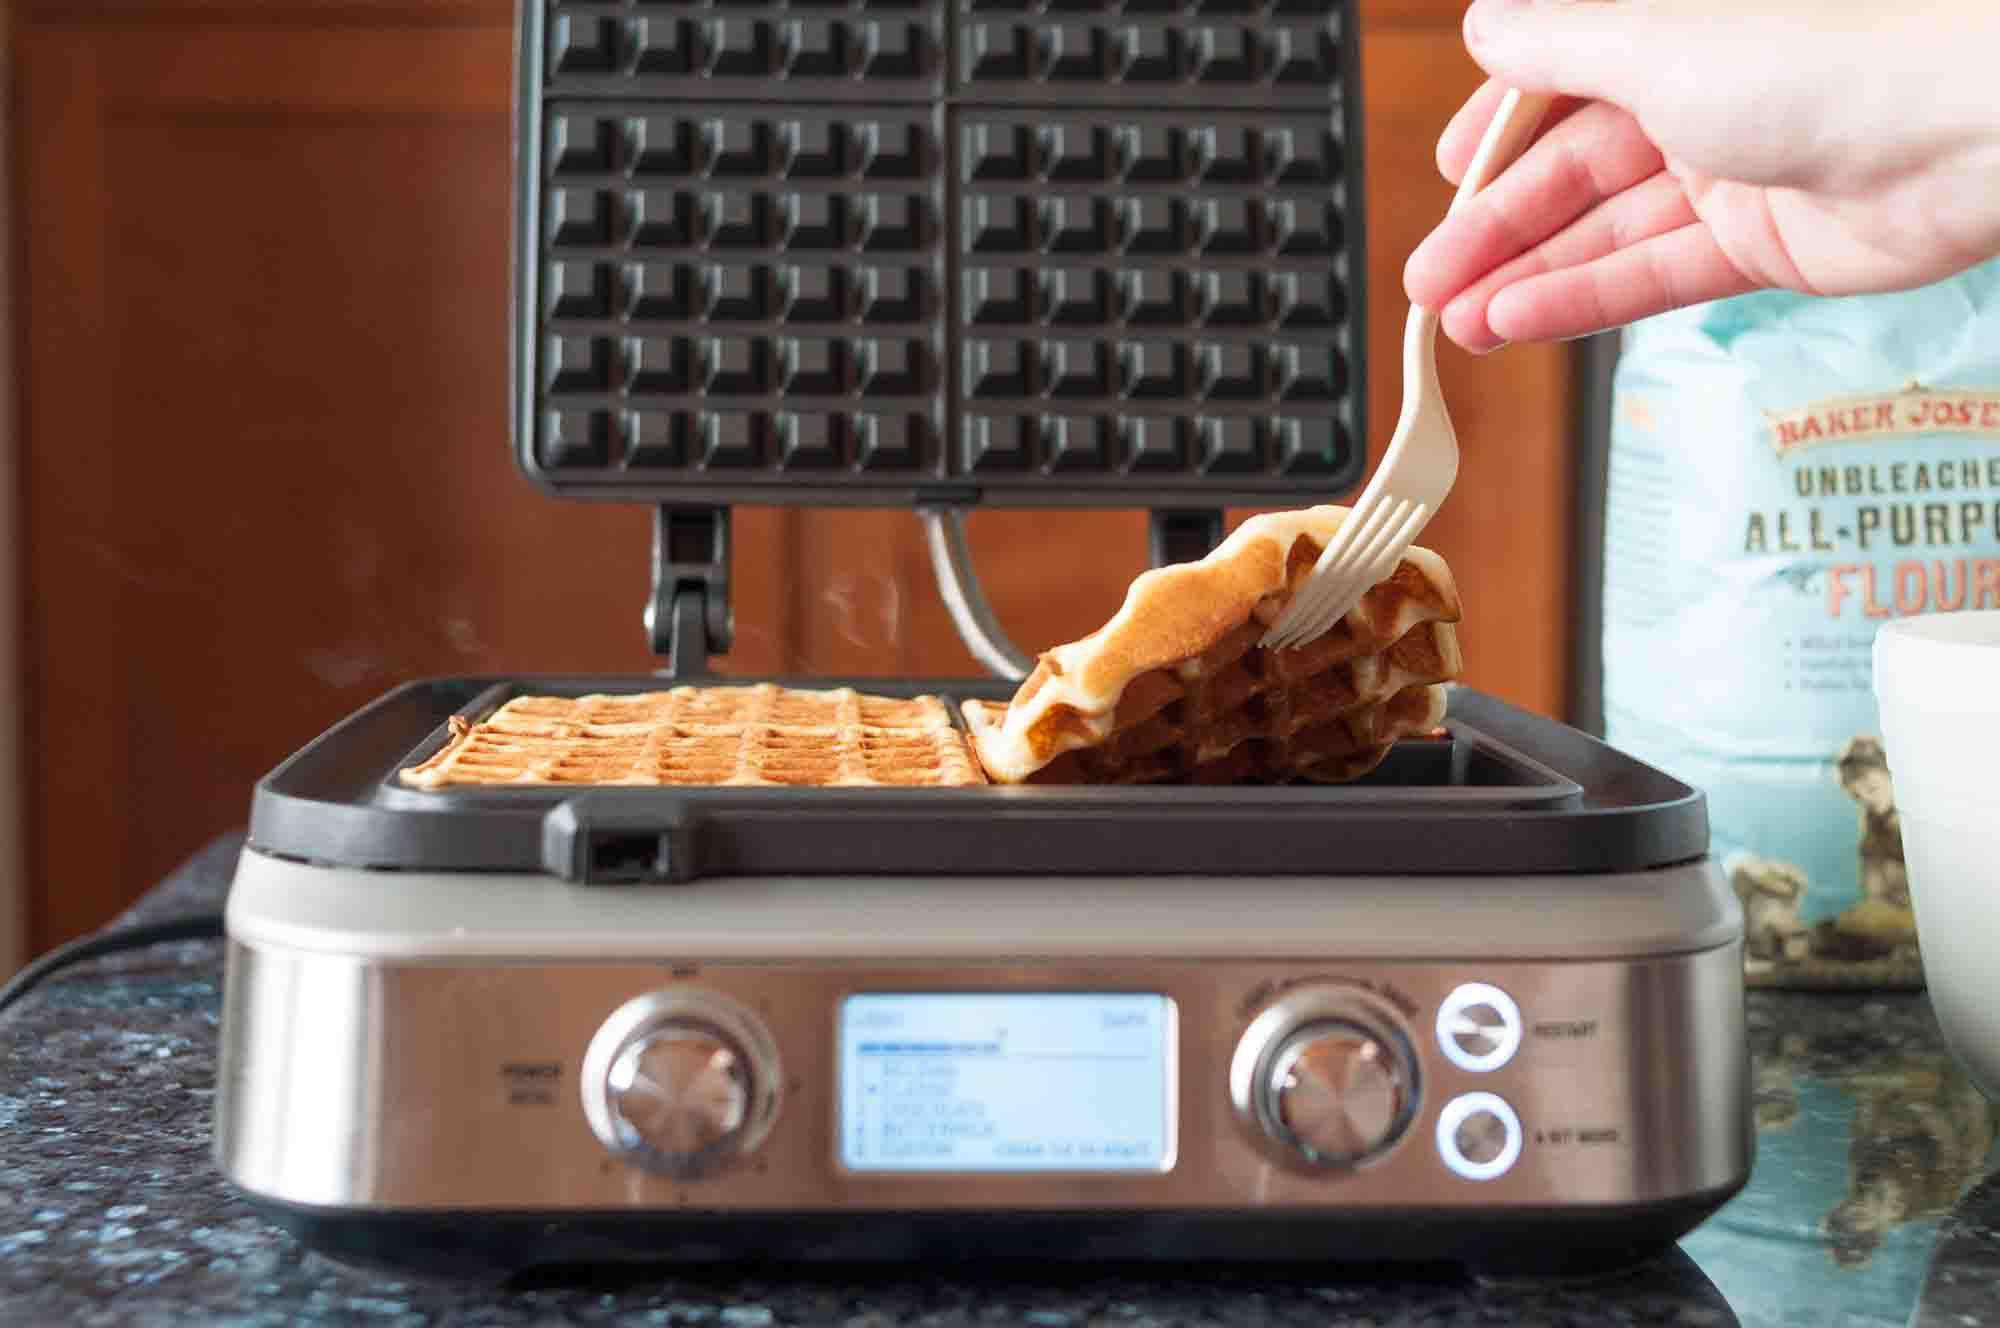 Easy Waffle Recipe for Buttermilk Waffles